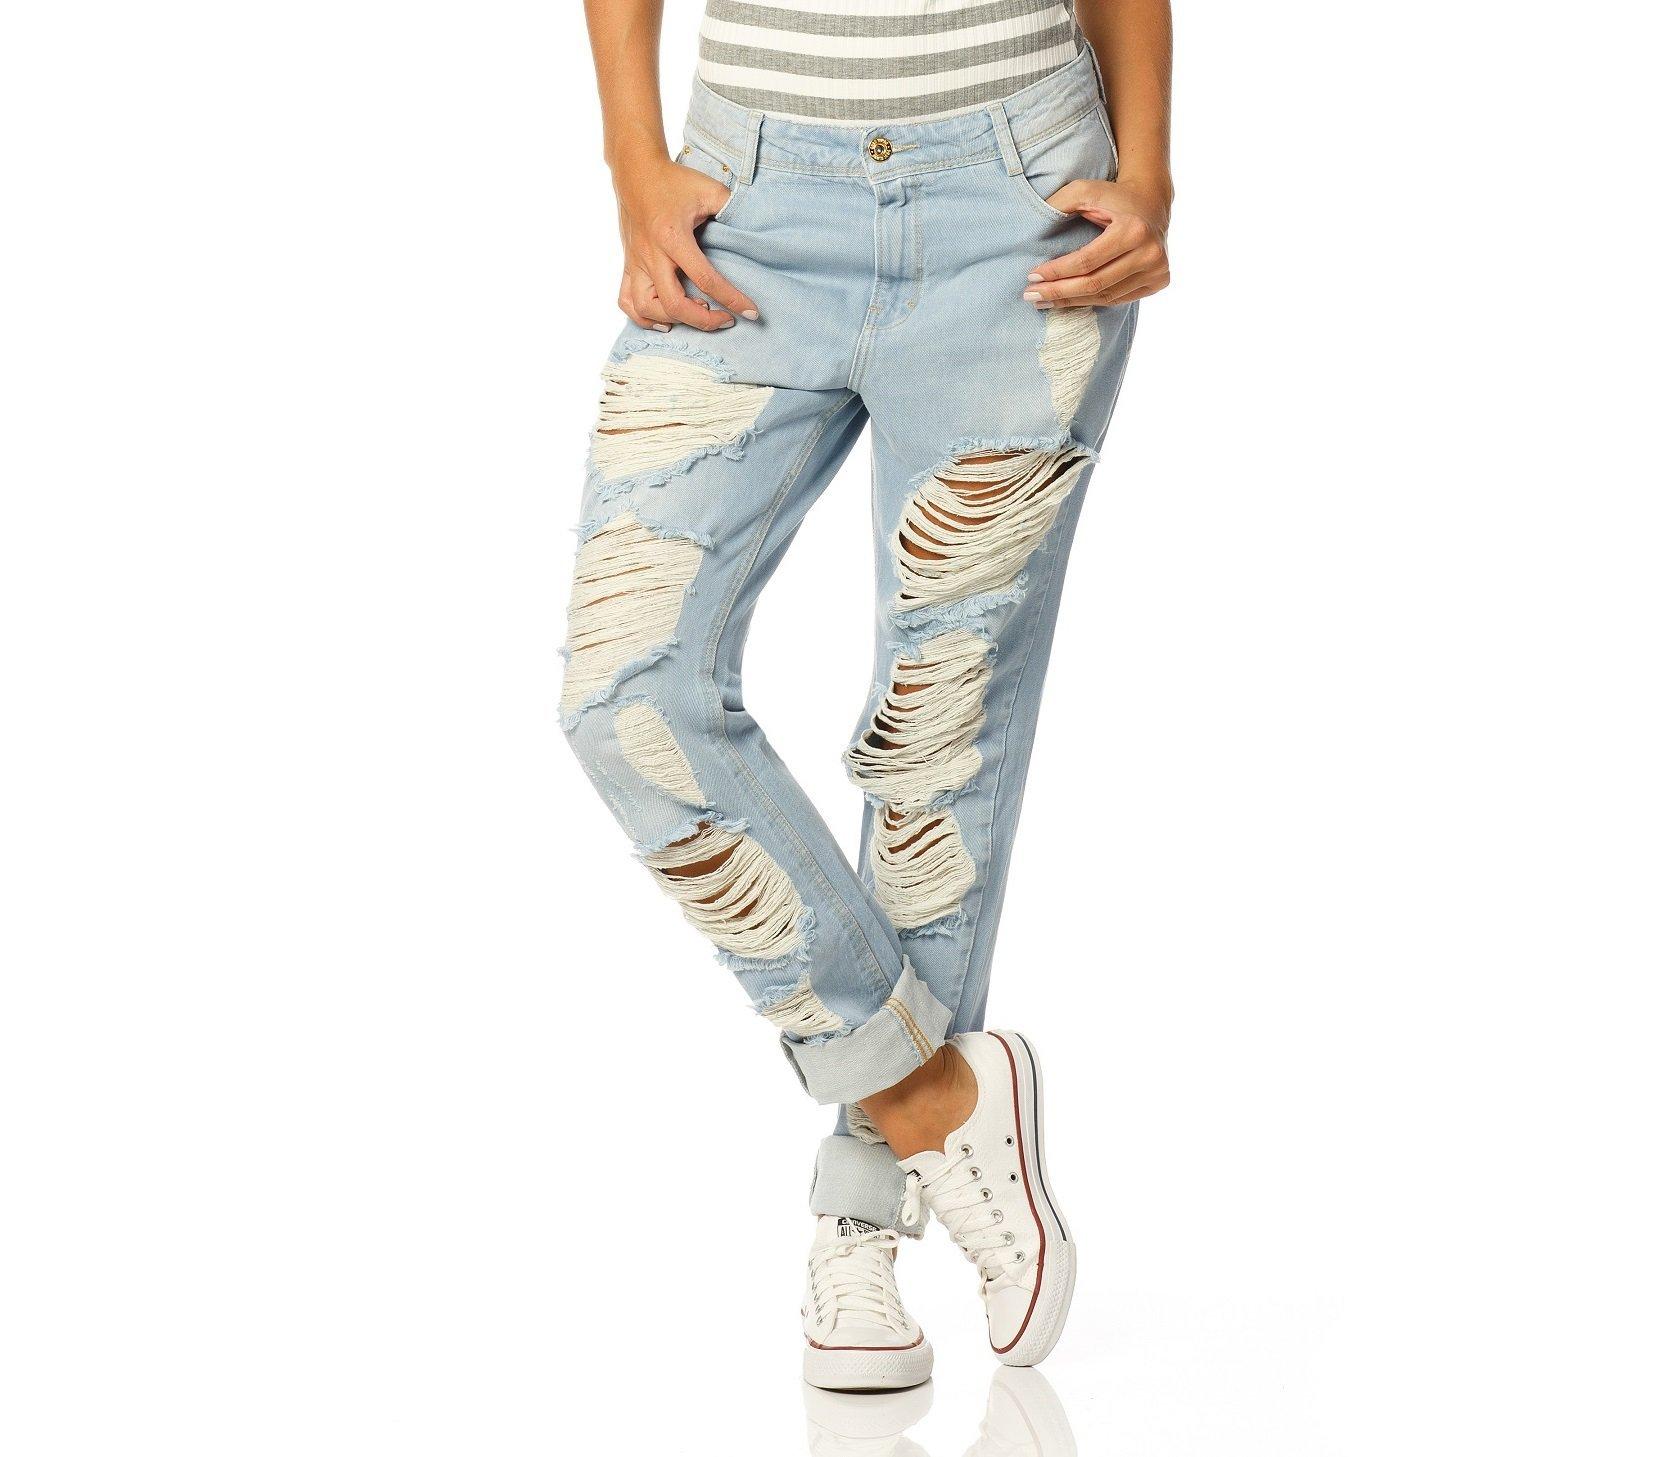 f54b4f154 Calças Jeans Feminina - Denim Zero